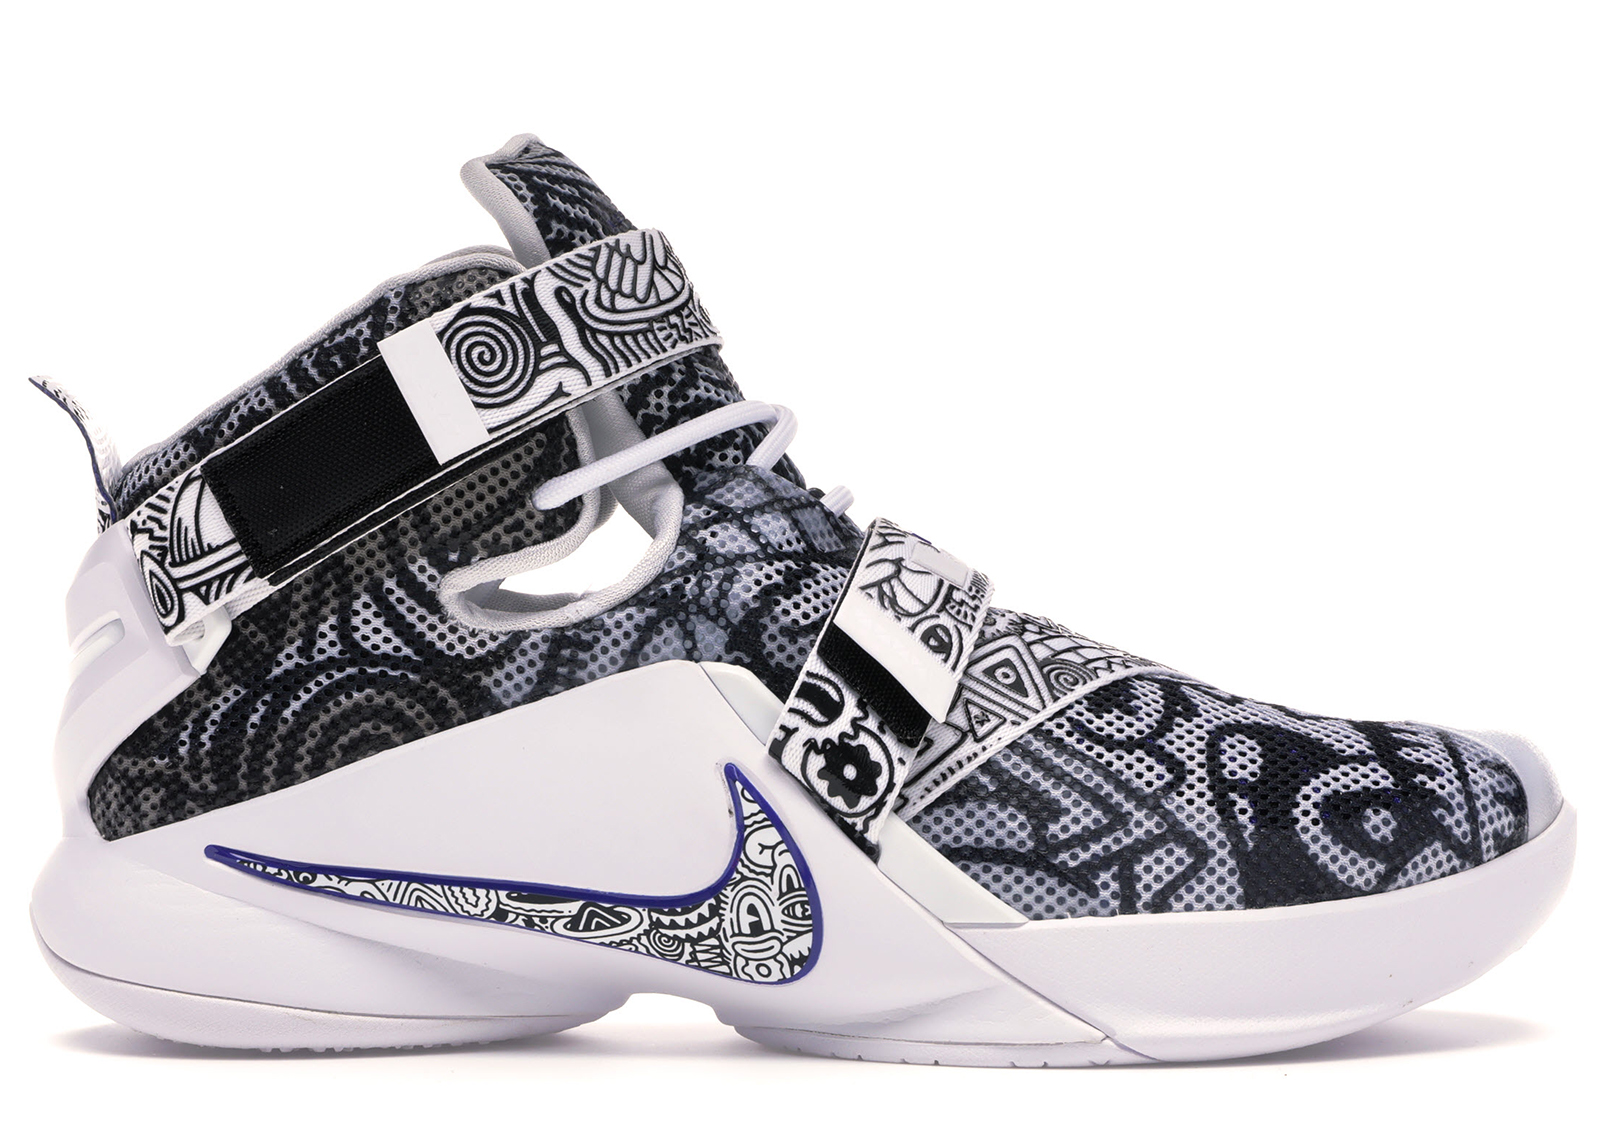 Nike LeBron Solider 9 Freegums - 810803-014